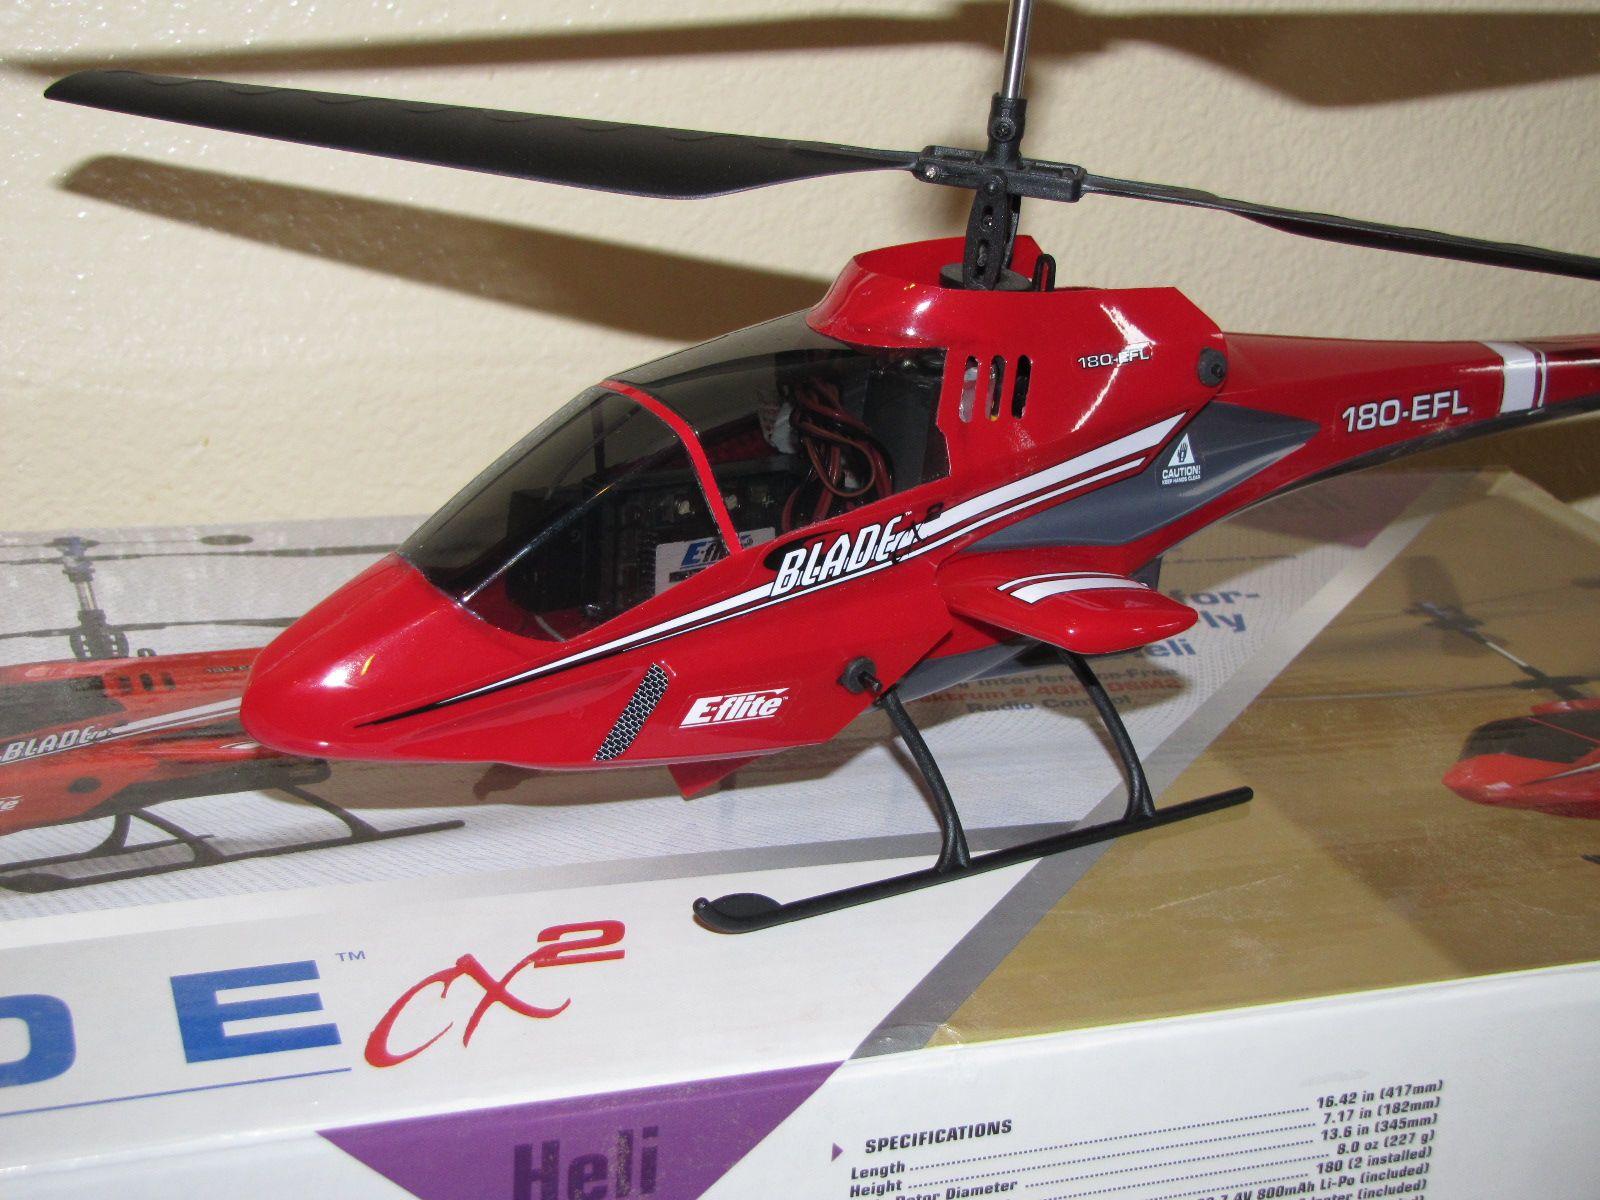 Elicottero E Flite Blade Cx2 : E flite blade cx rtf with extras r c tech forums